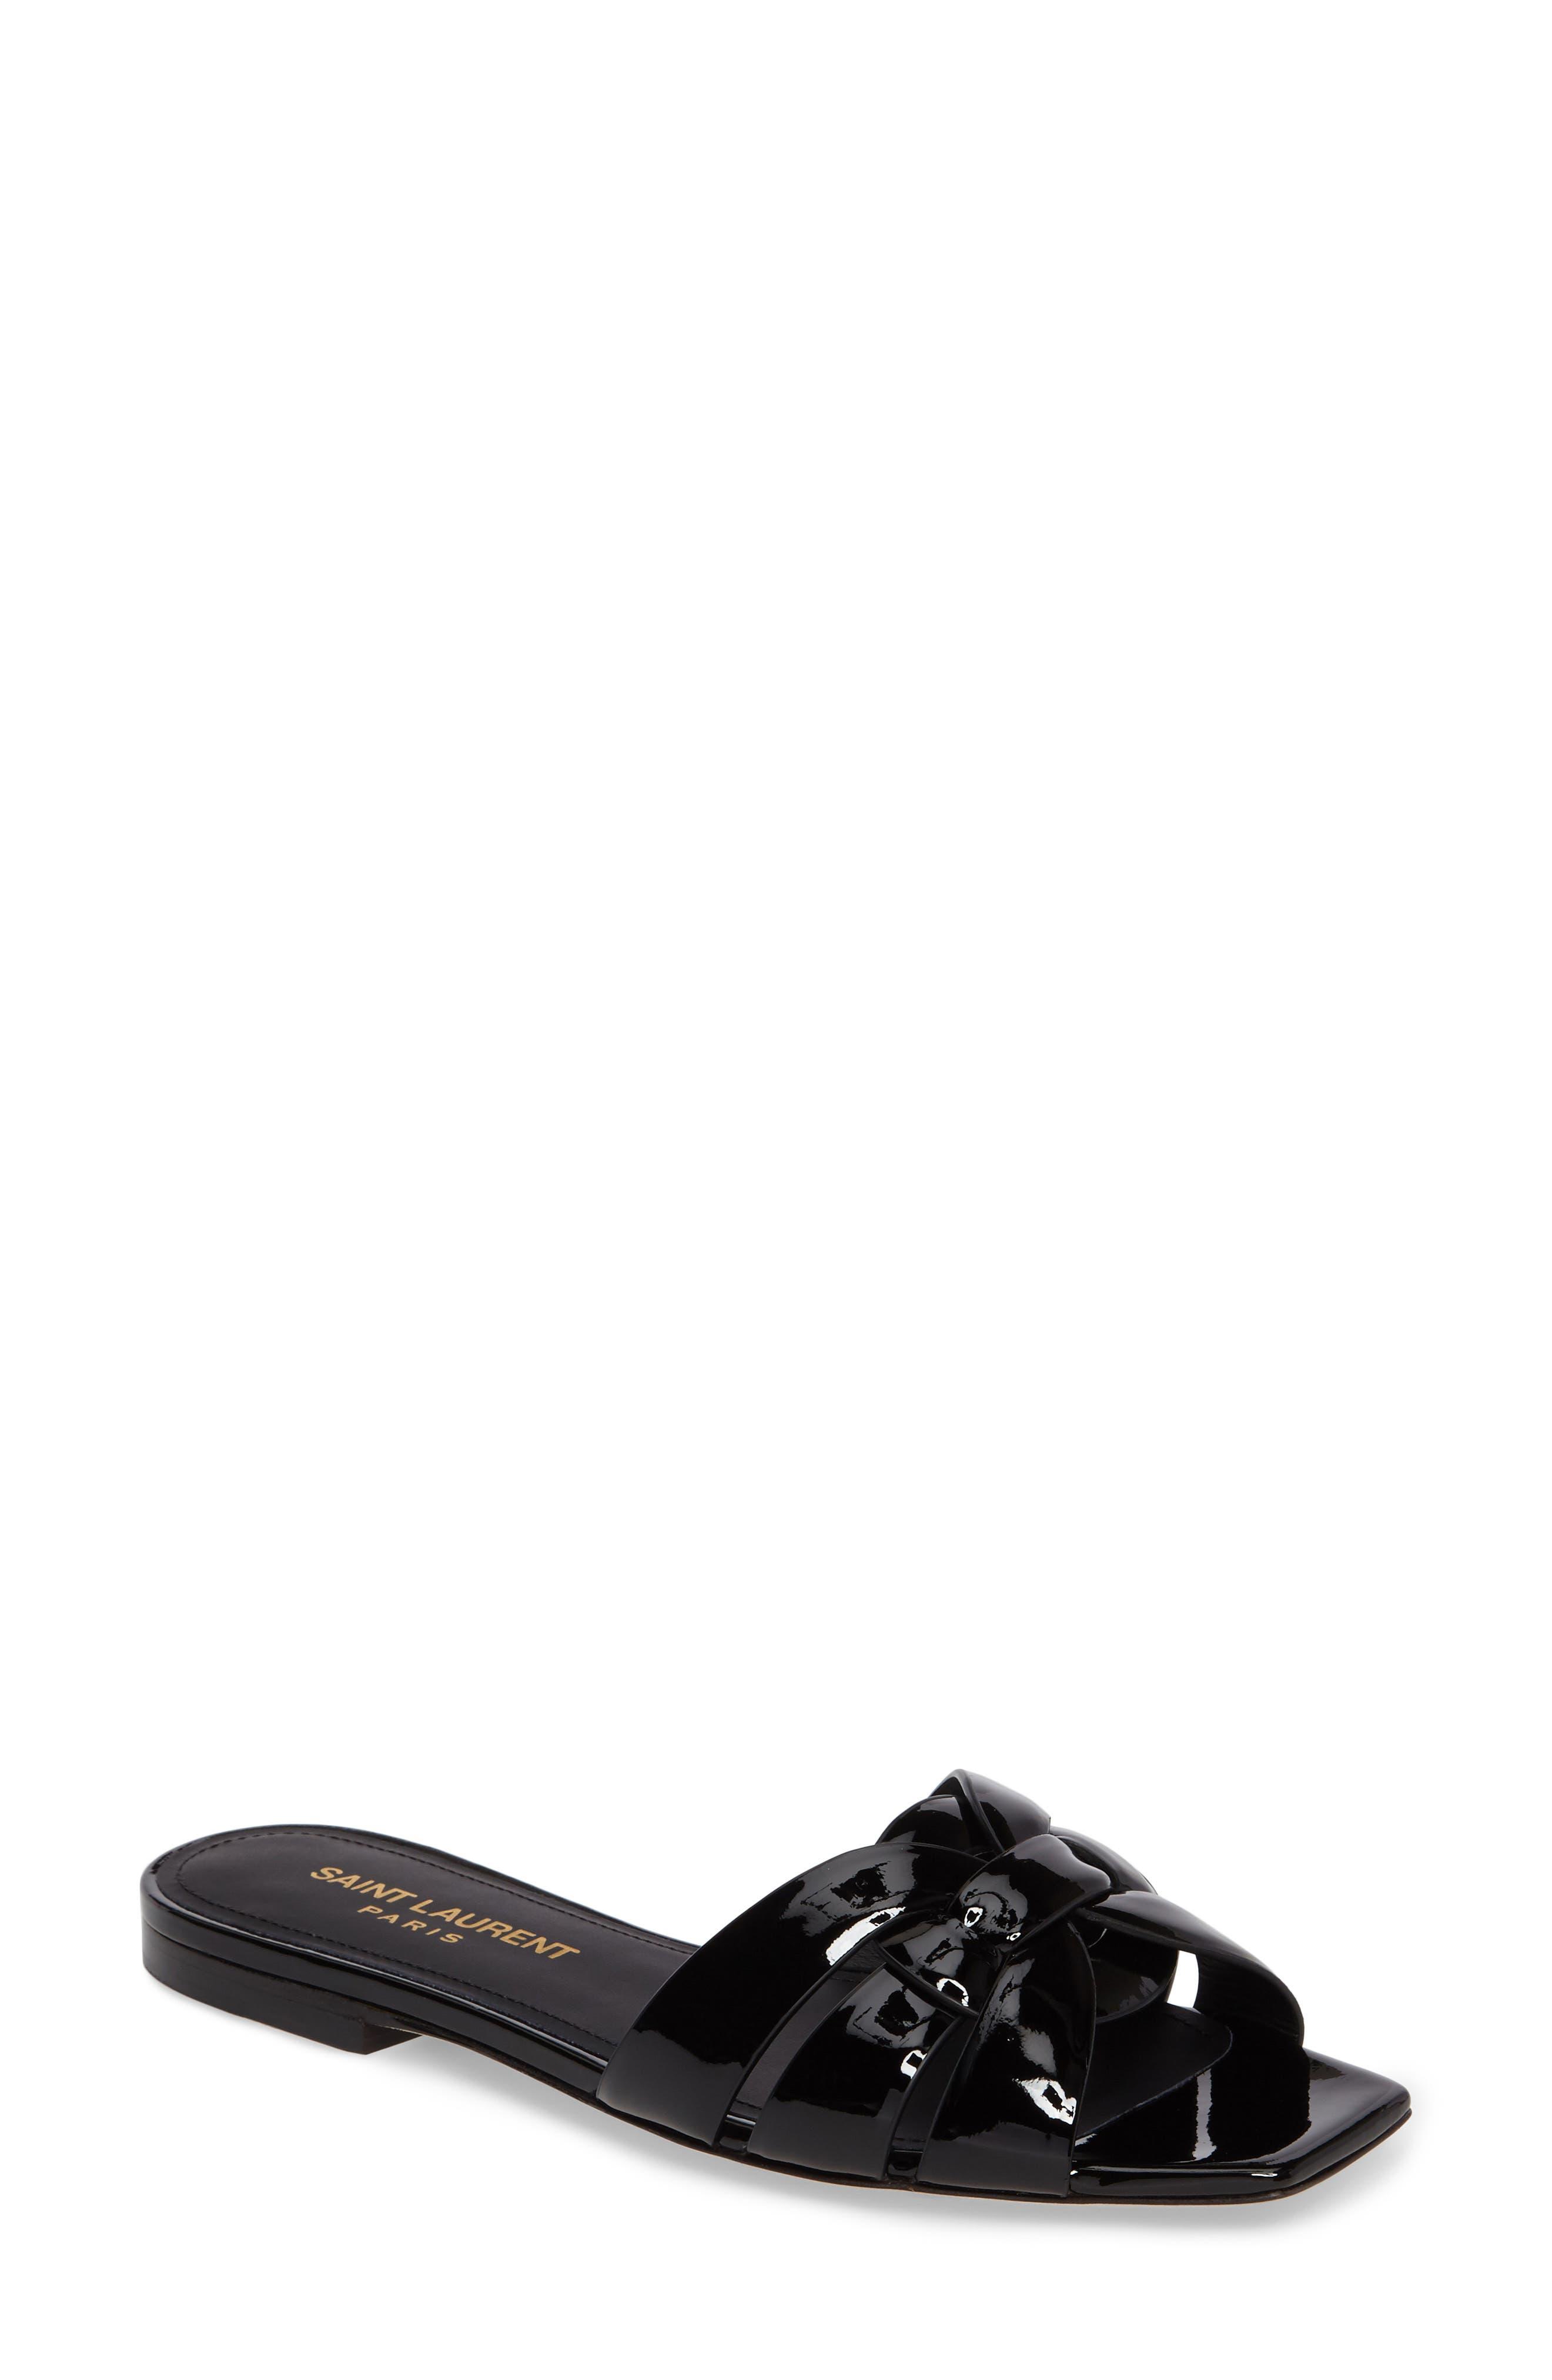 SAINT LAURENT, Tribute Slide Sandal, Main thumbnail 1, color, BLACK PATENT